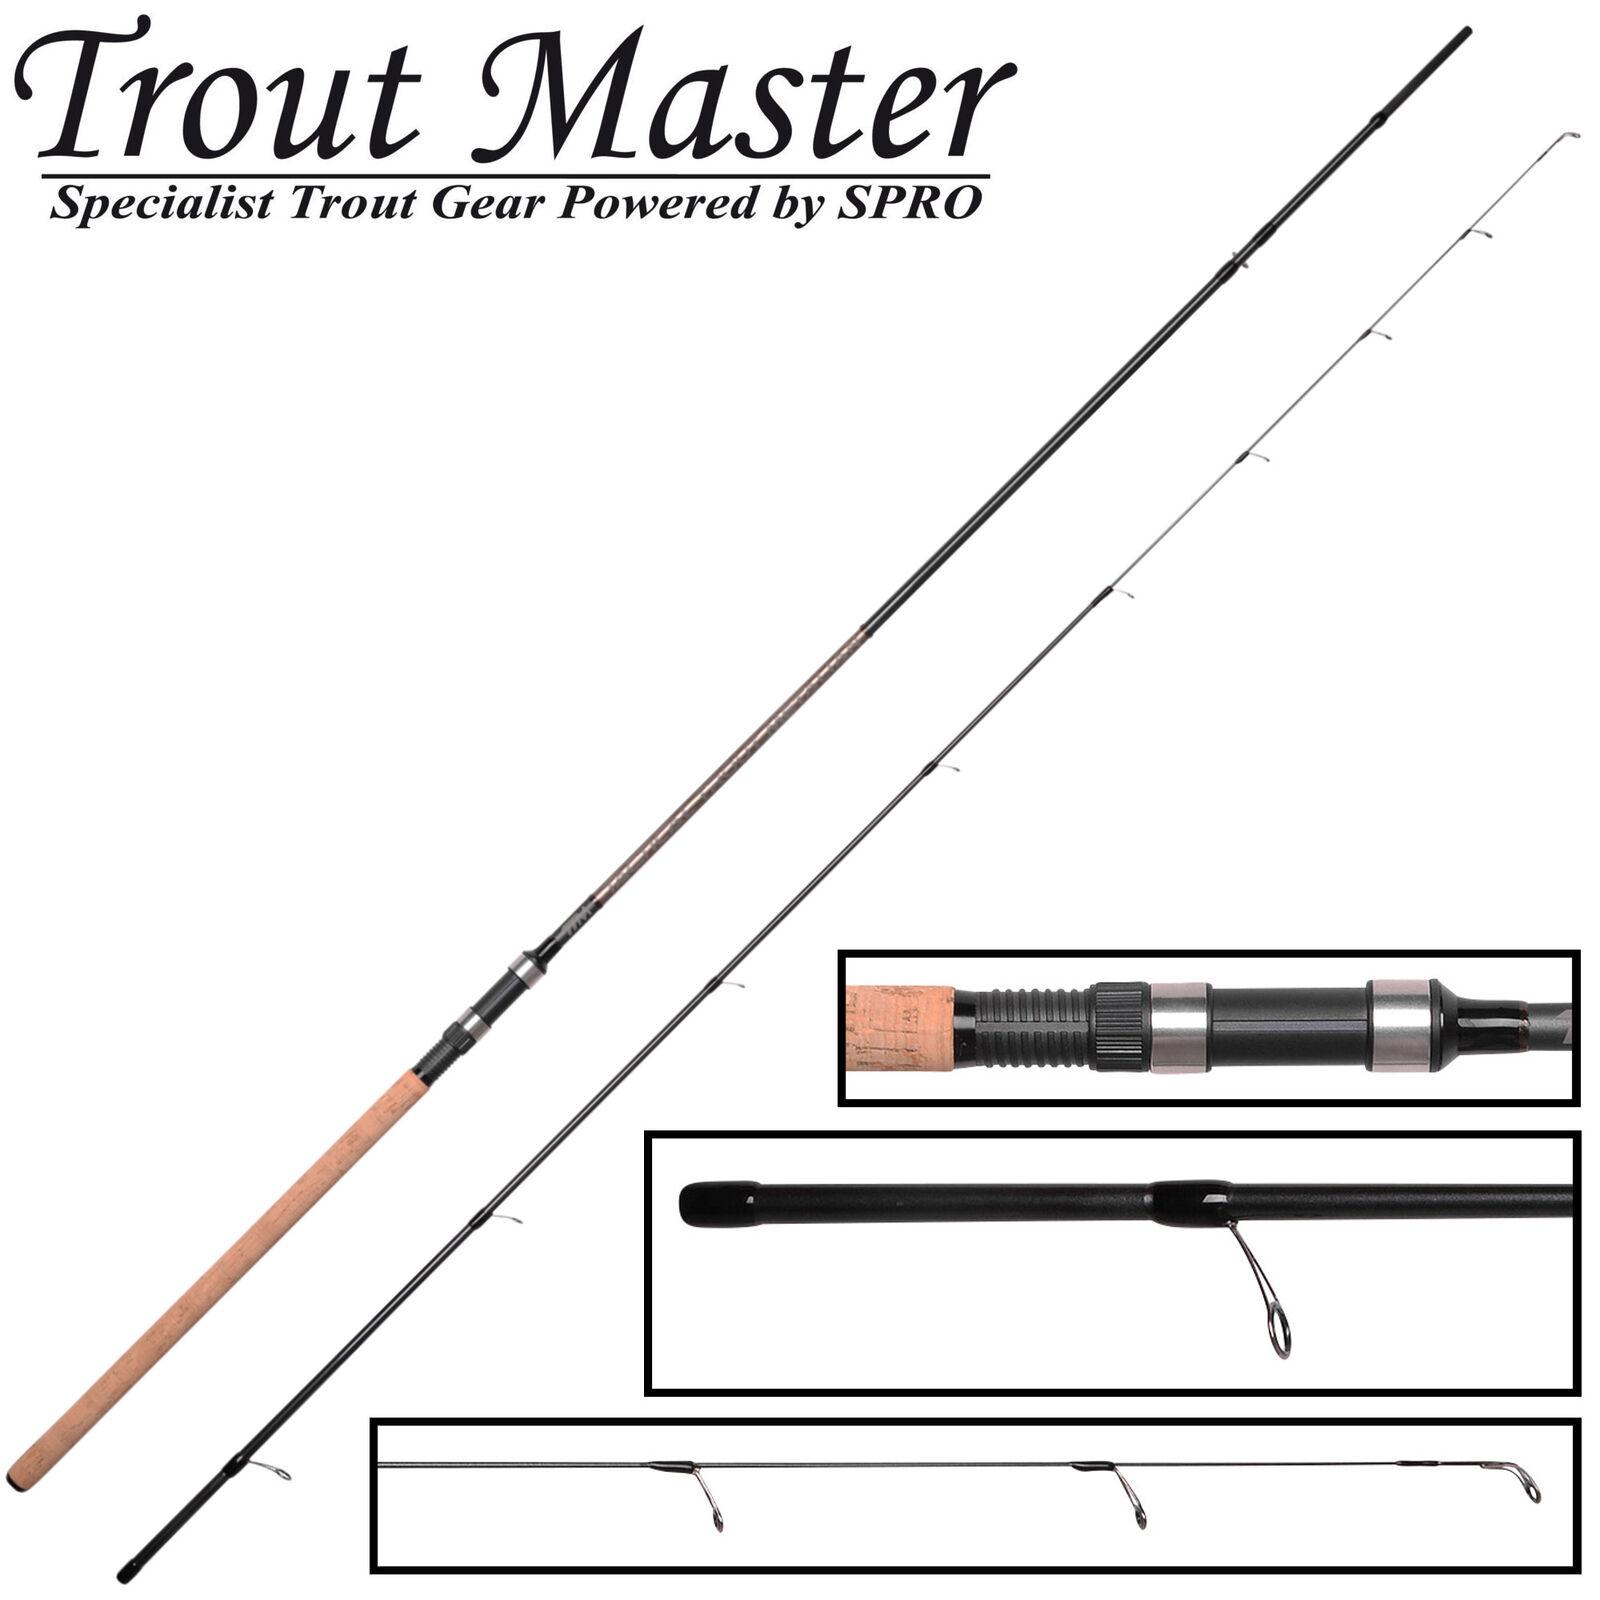 Trout Master Tactical Trout Metalian 2,7m 5-40g - Forellenrute, Spinnrute  | Export